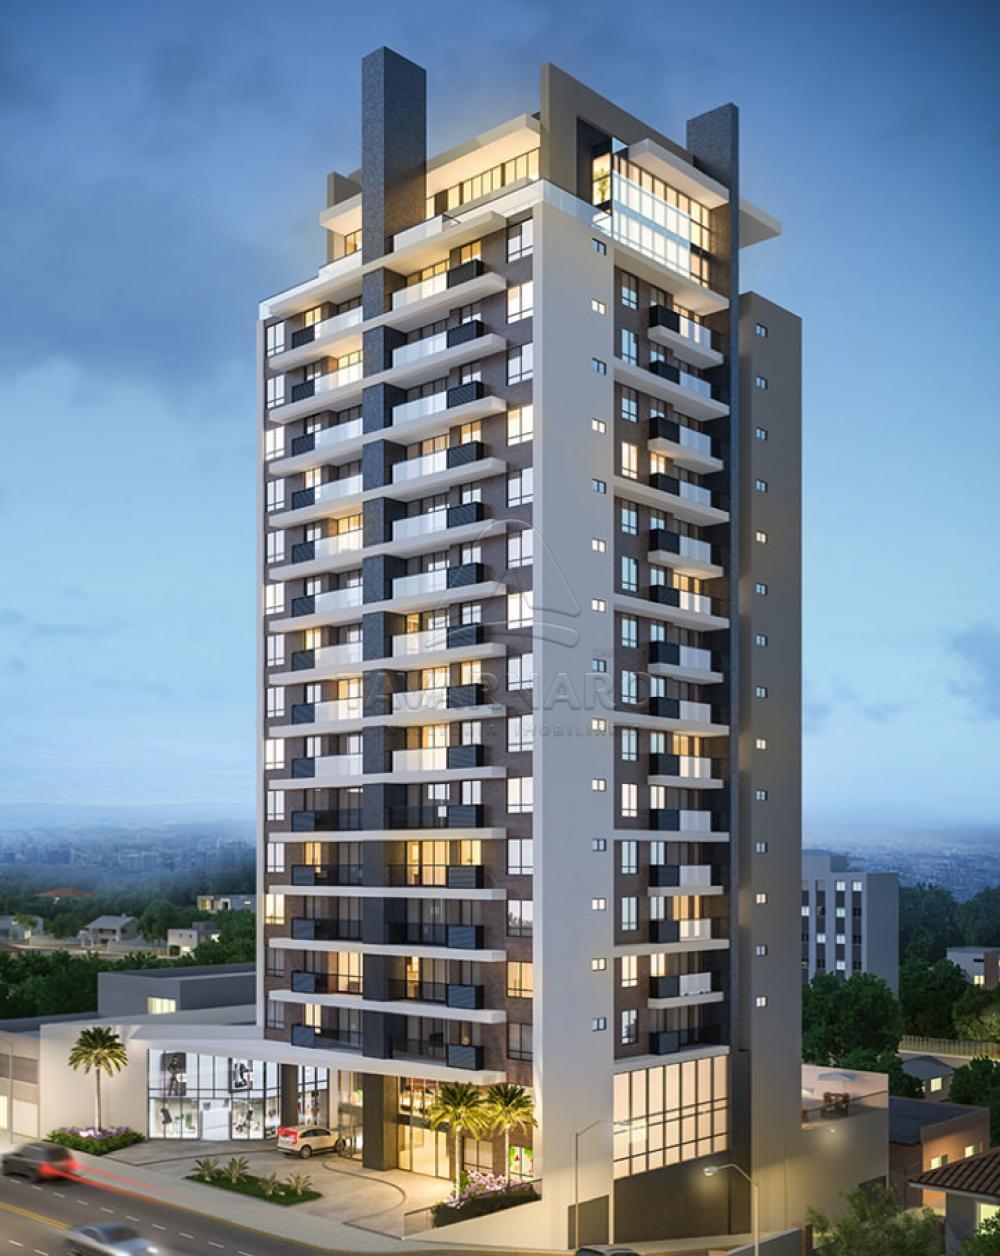 Ponta Grossa Olarias Apartamento Venda R$586.145,00 Condominio R$450,00 3 Dormitorios 2 Vagas Area construida 167.47m2